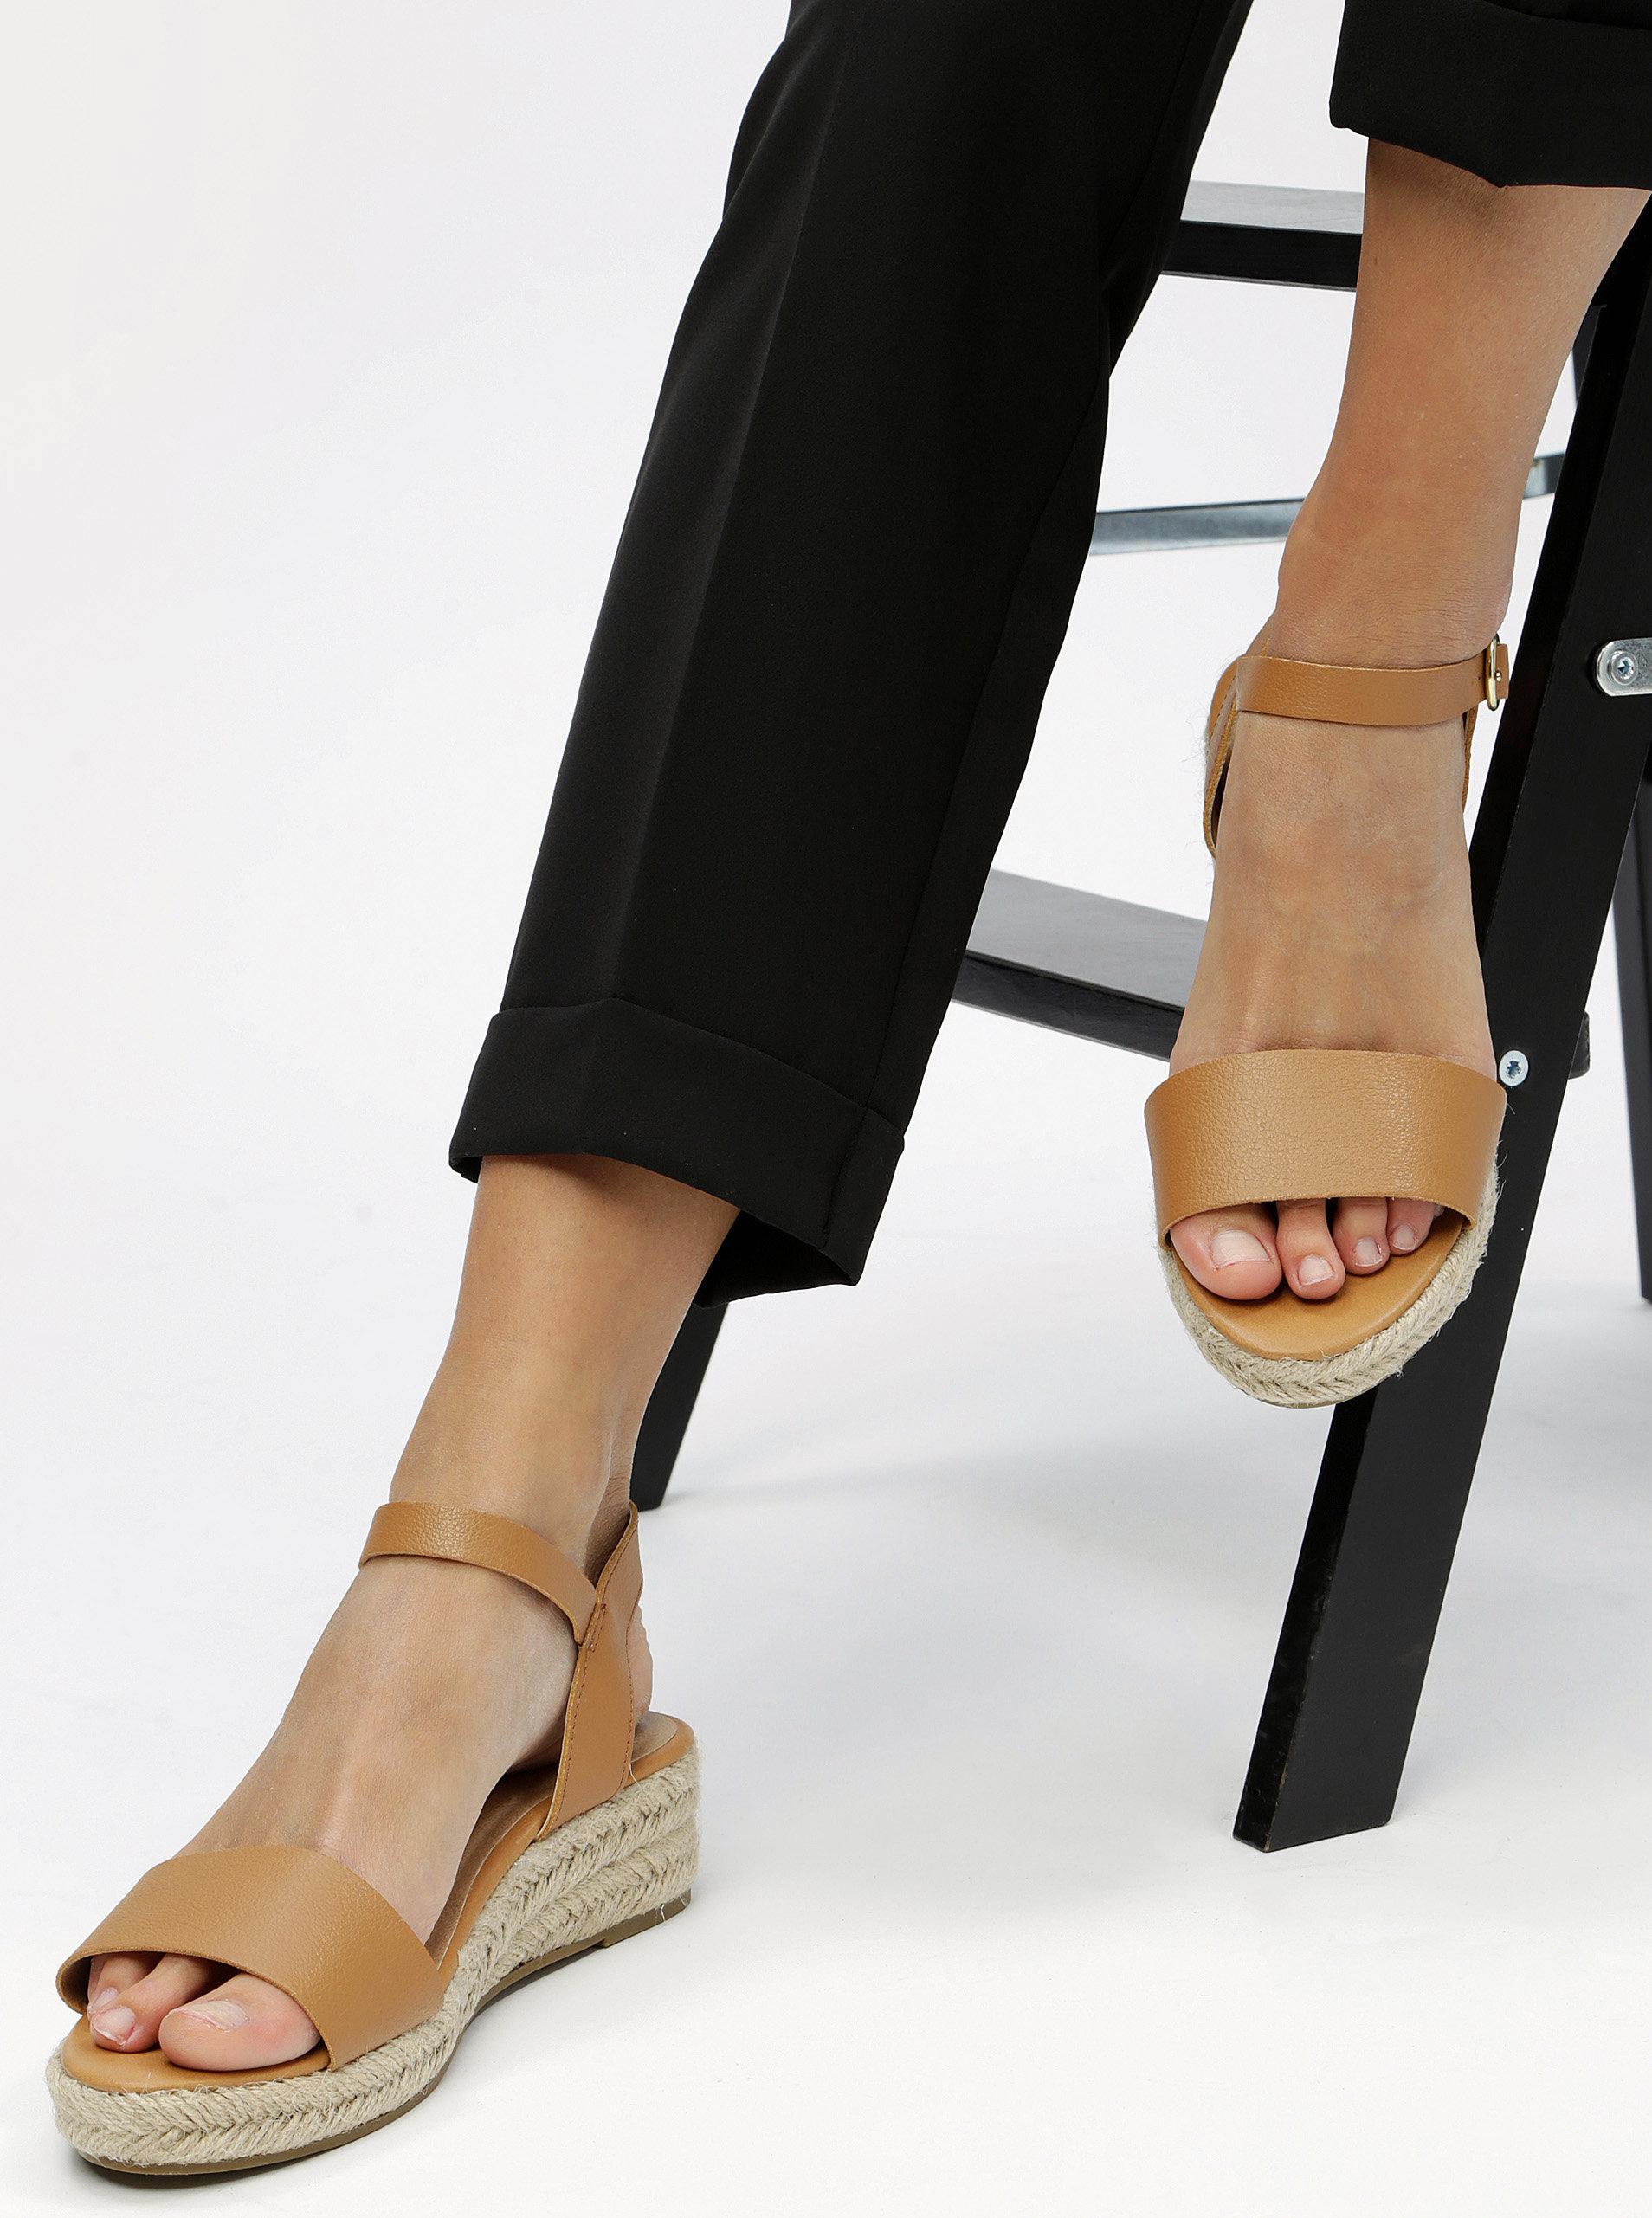 633aa4f97f7c Hnedé sandálky na platforme Dorothy Perkins ...